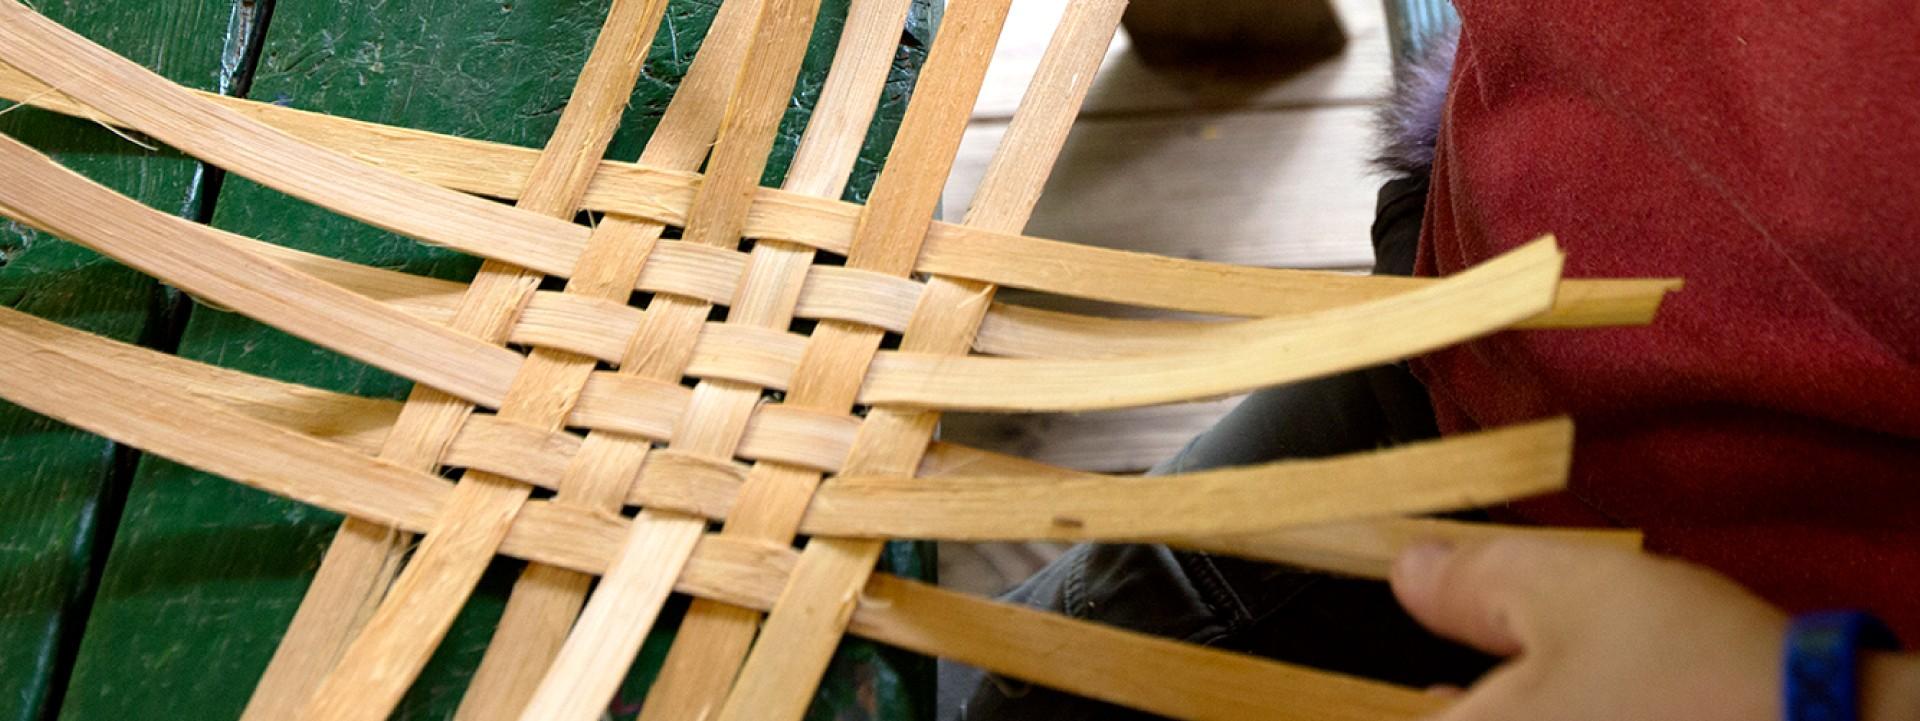 BSA Crafts- Basket Weaving